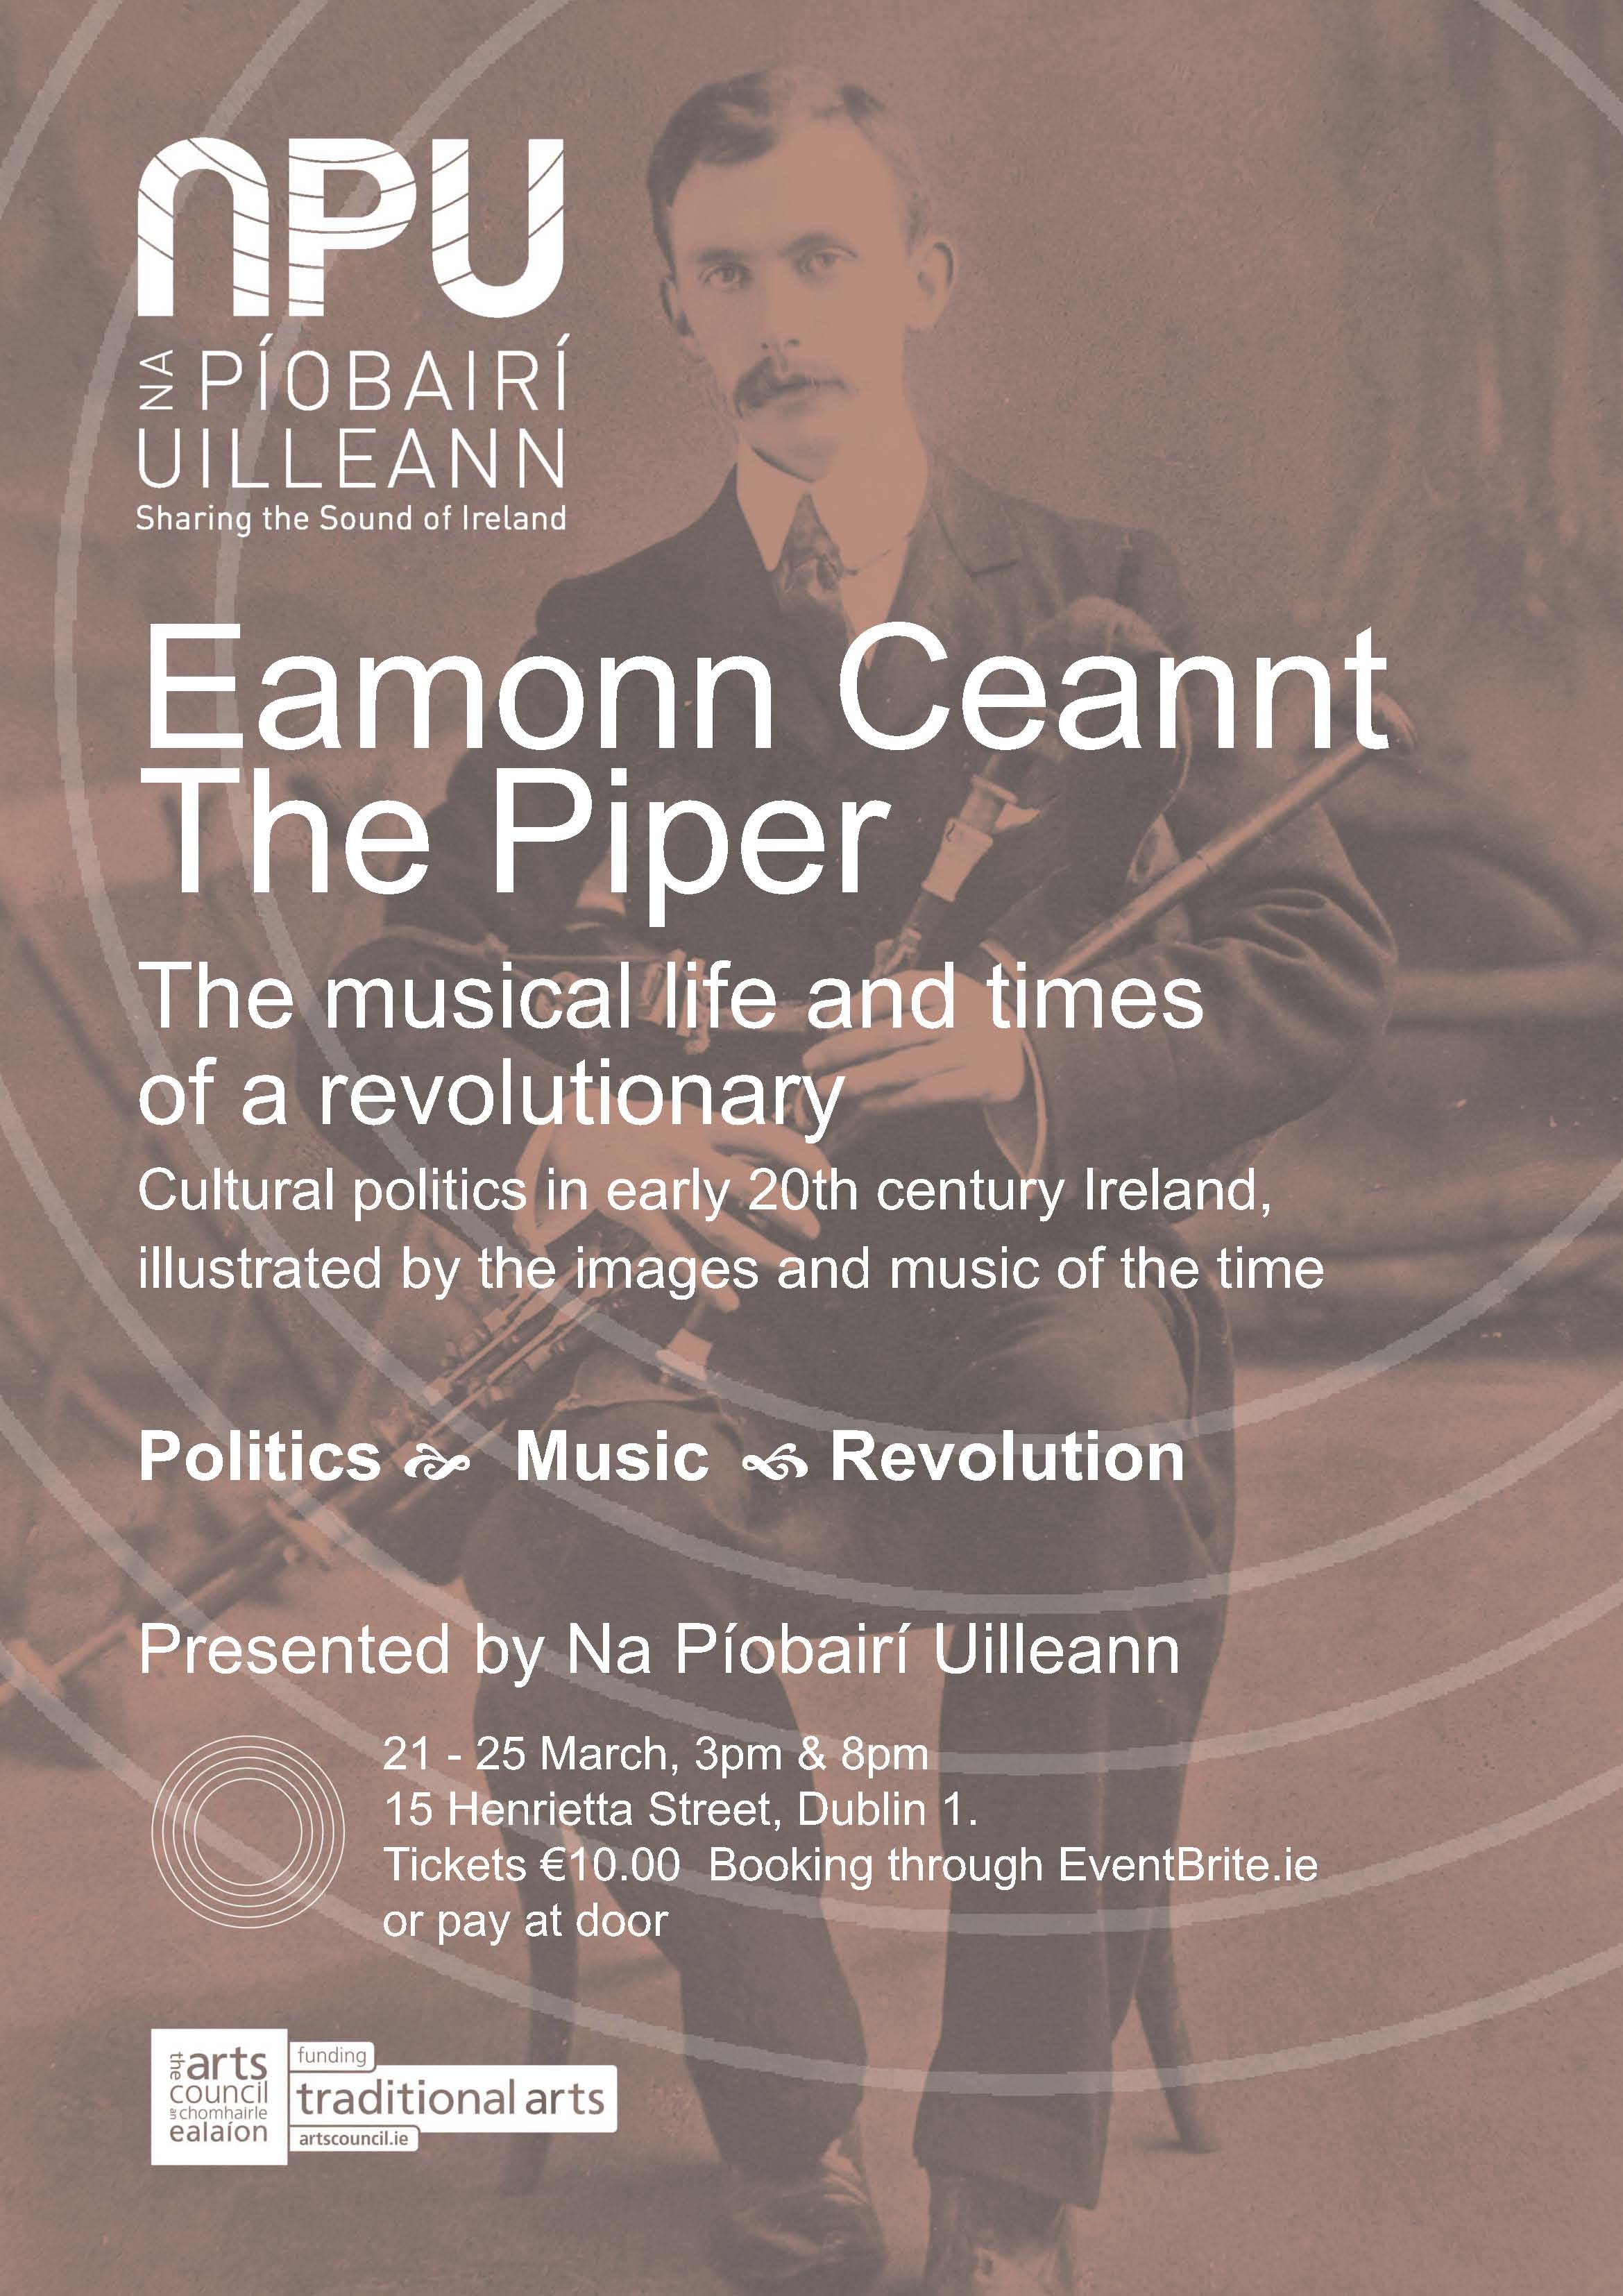 Eamonn Ceannt The Piper Poster